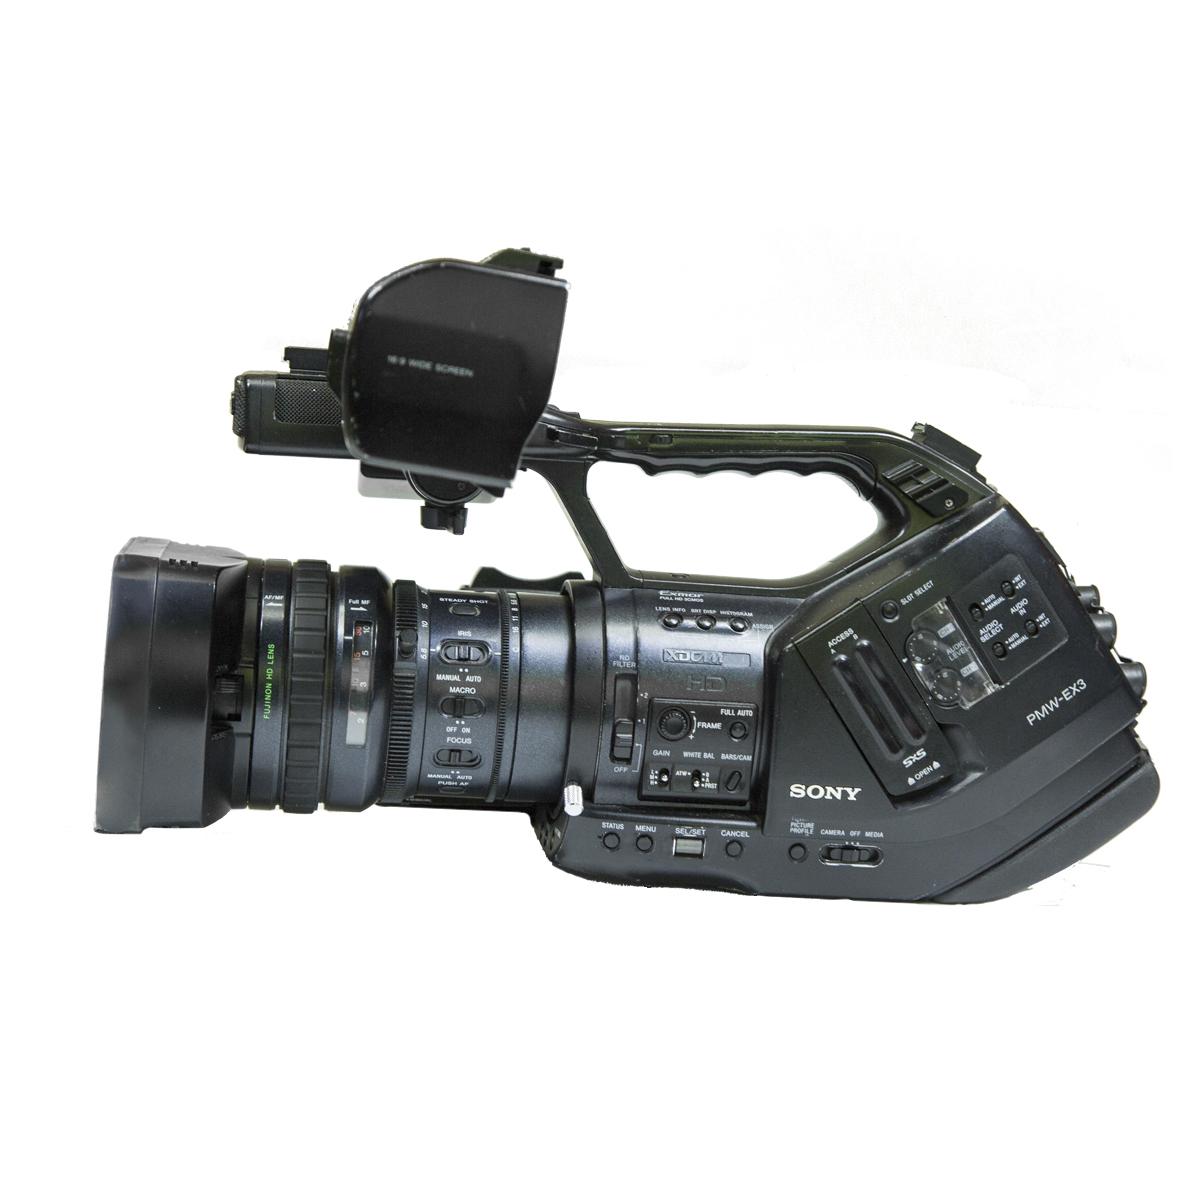 аренда Комплект камеры Sony PMW EX3 в Москве